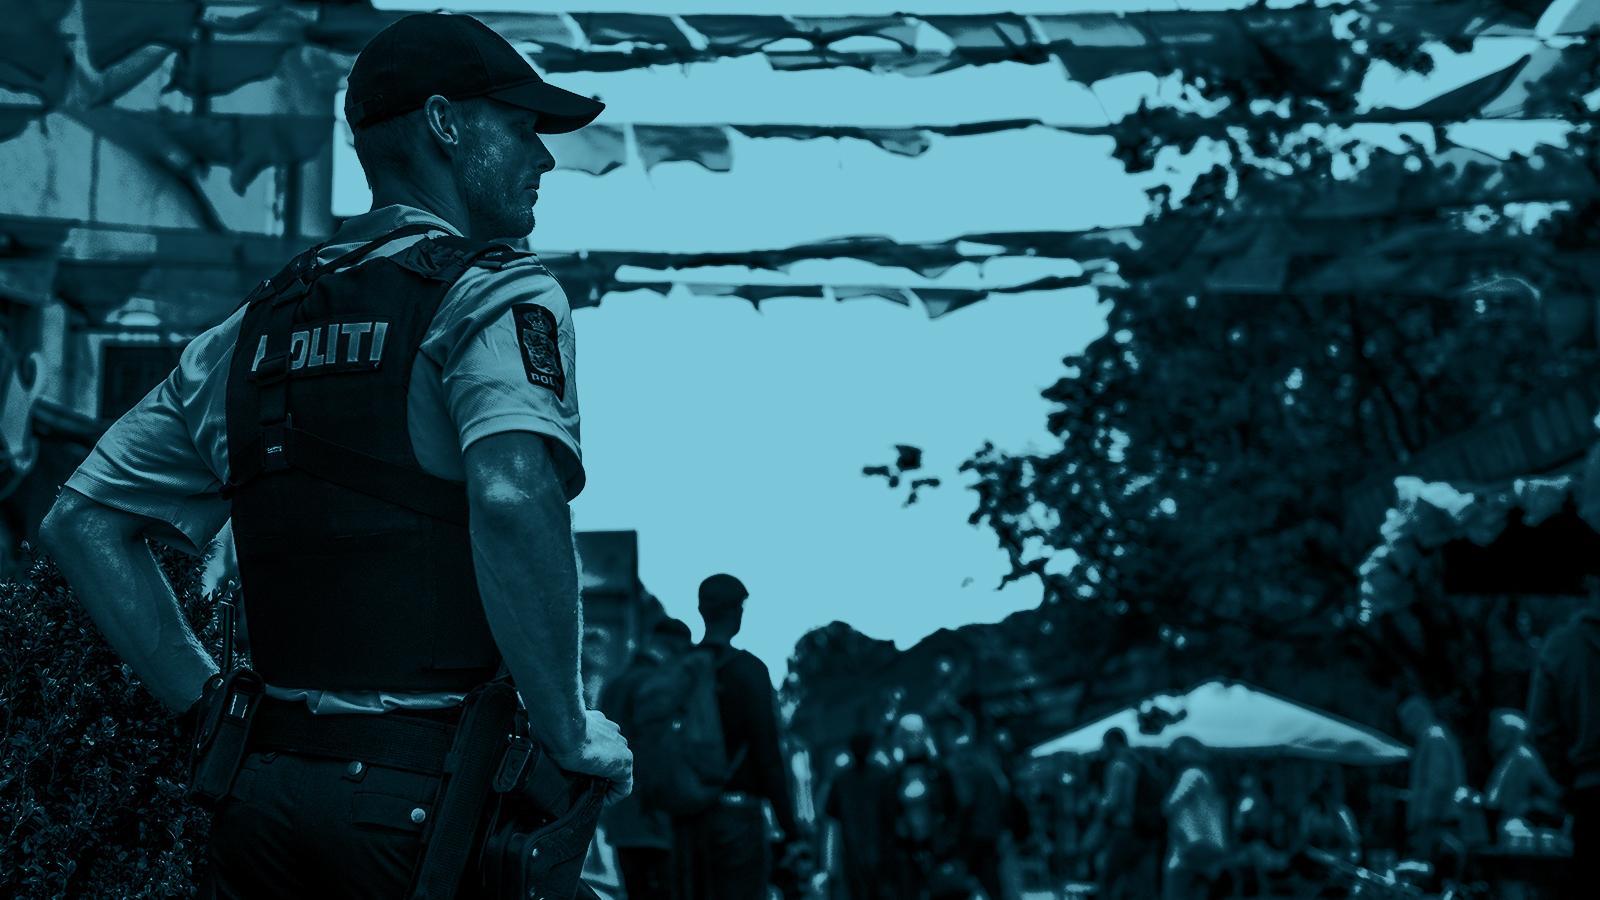 politiagent.jpg